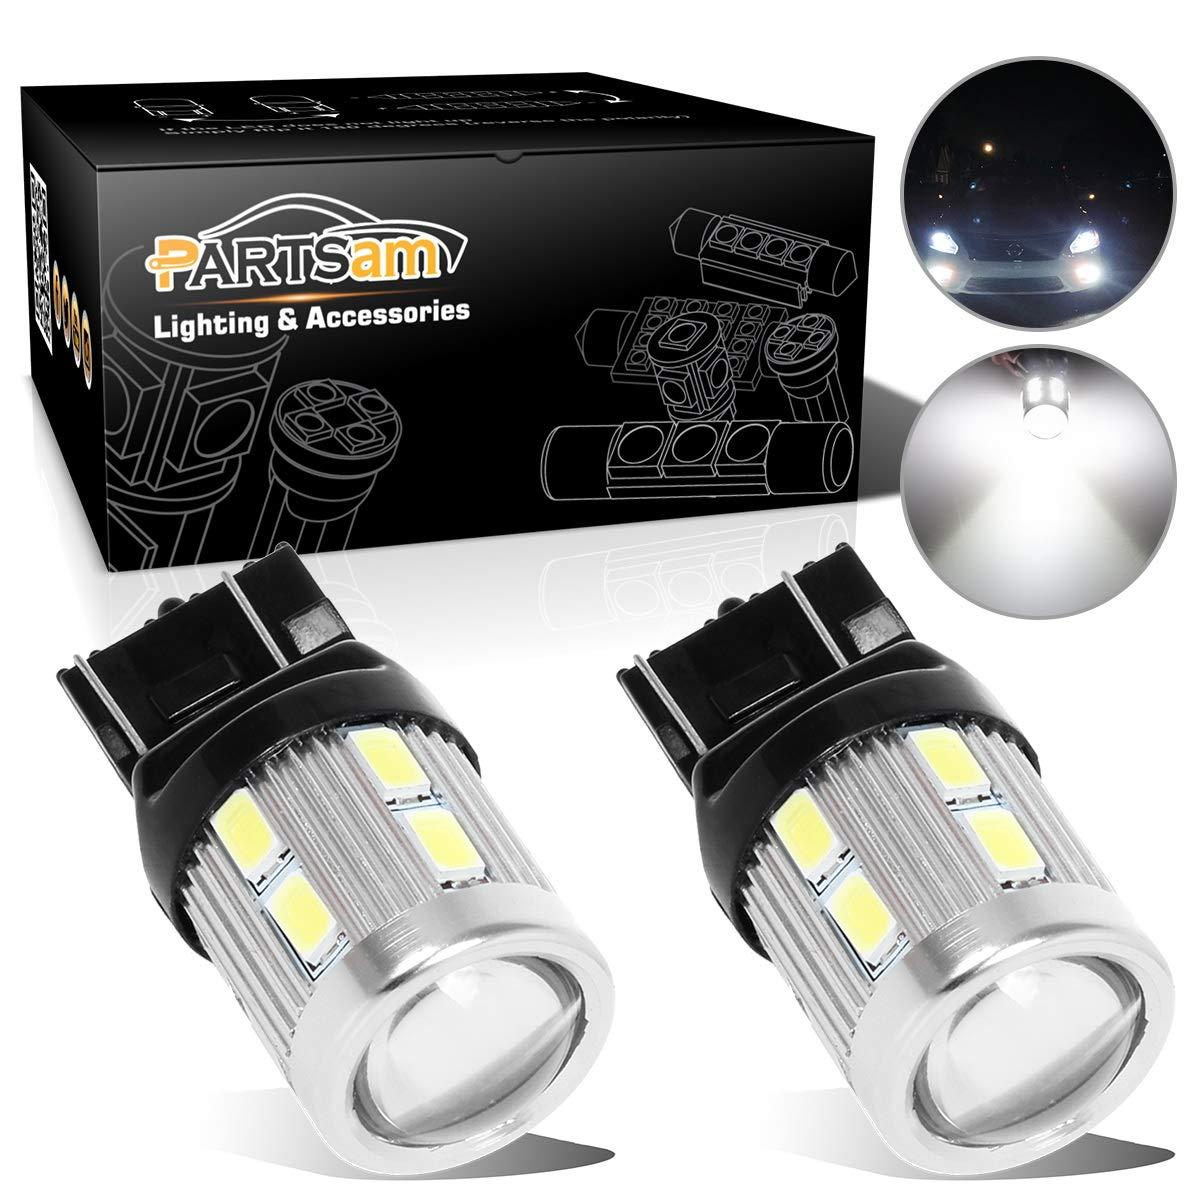 Partsam 2pcs 6000K White Super Power 7443 7440 W21W Backup Light Reverse Lamps 1-Cree-XPE 5730 12SMD Daytime Running Light DRL Parking Light